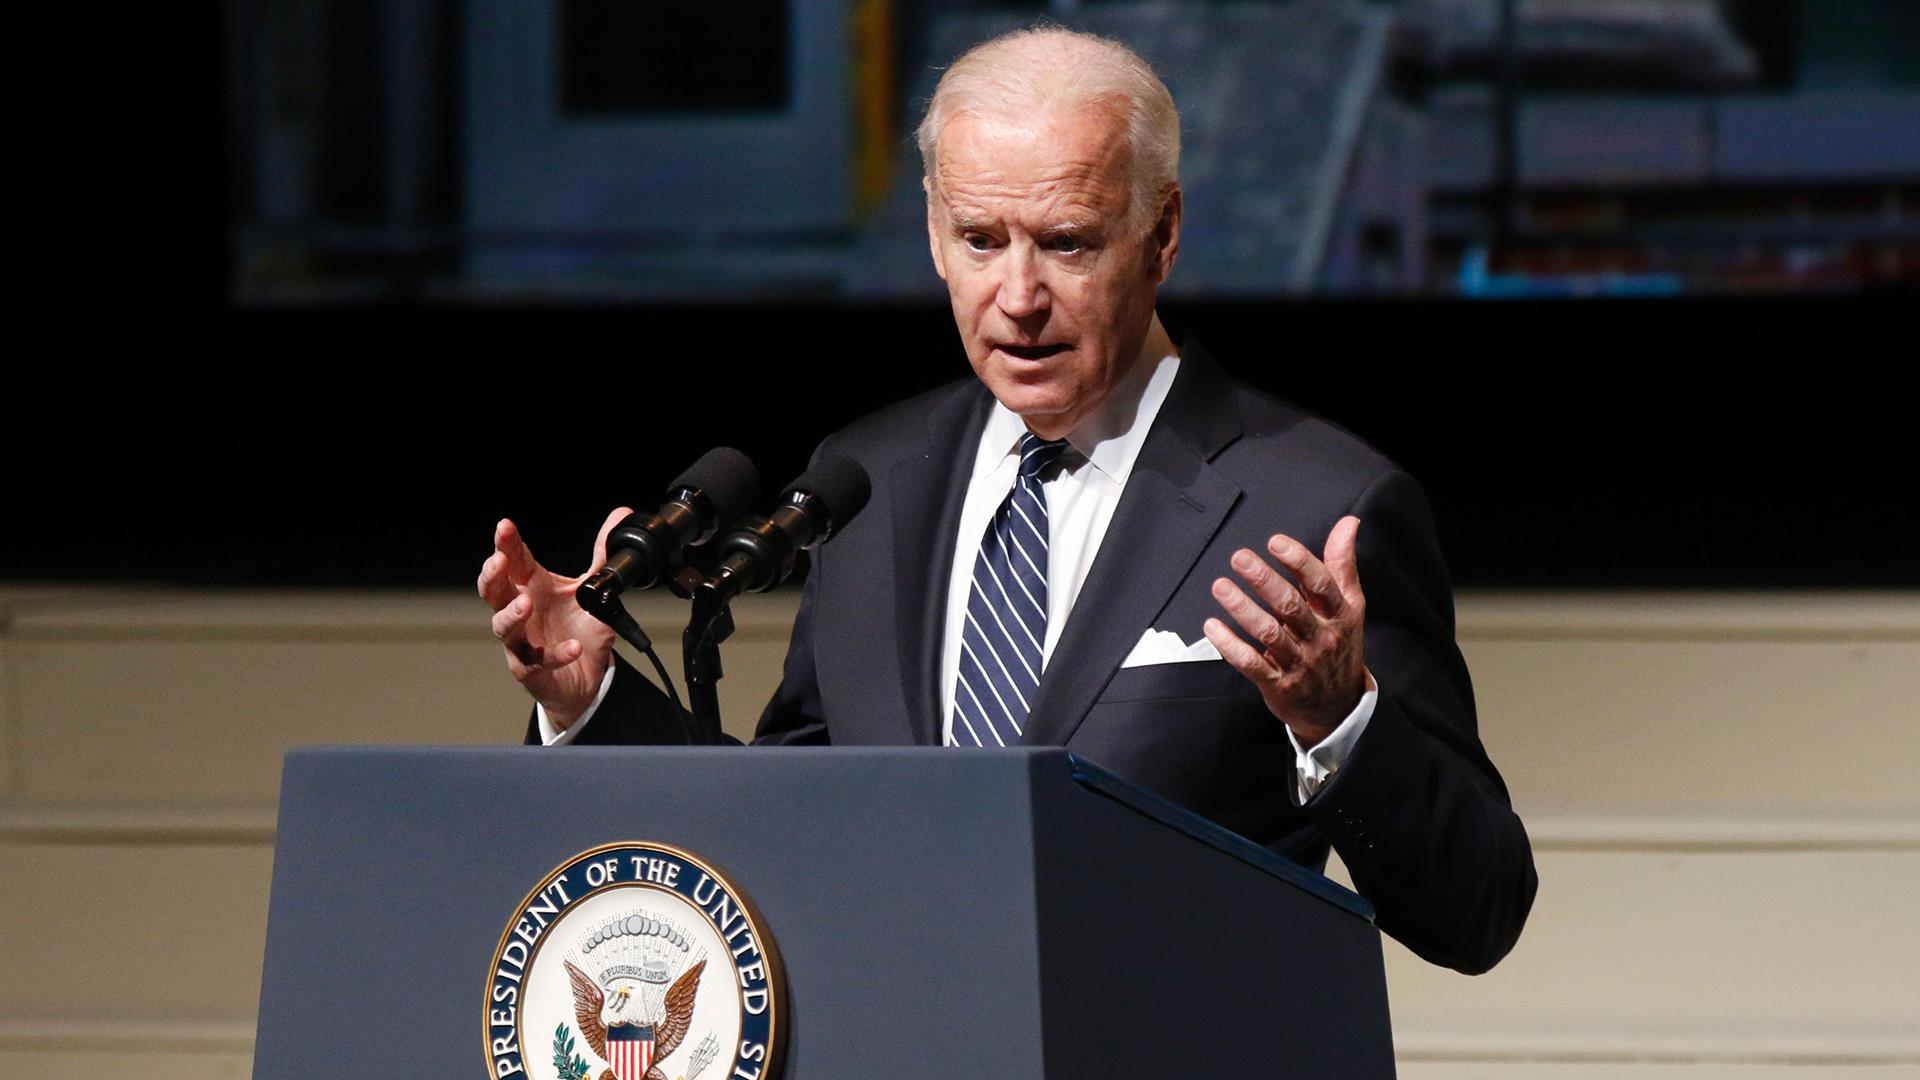 WATCH LIVE: VP Biden delivers address on nuclear weapons https://t.co/StB5KpljsB https://t.co/DCIm0sEZbU